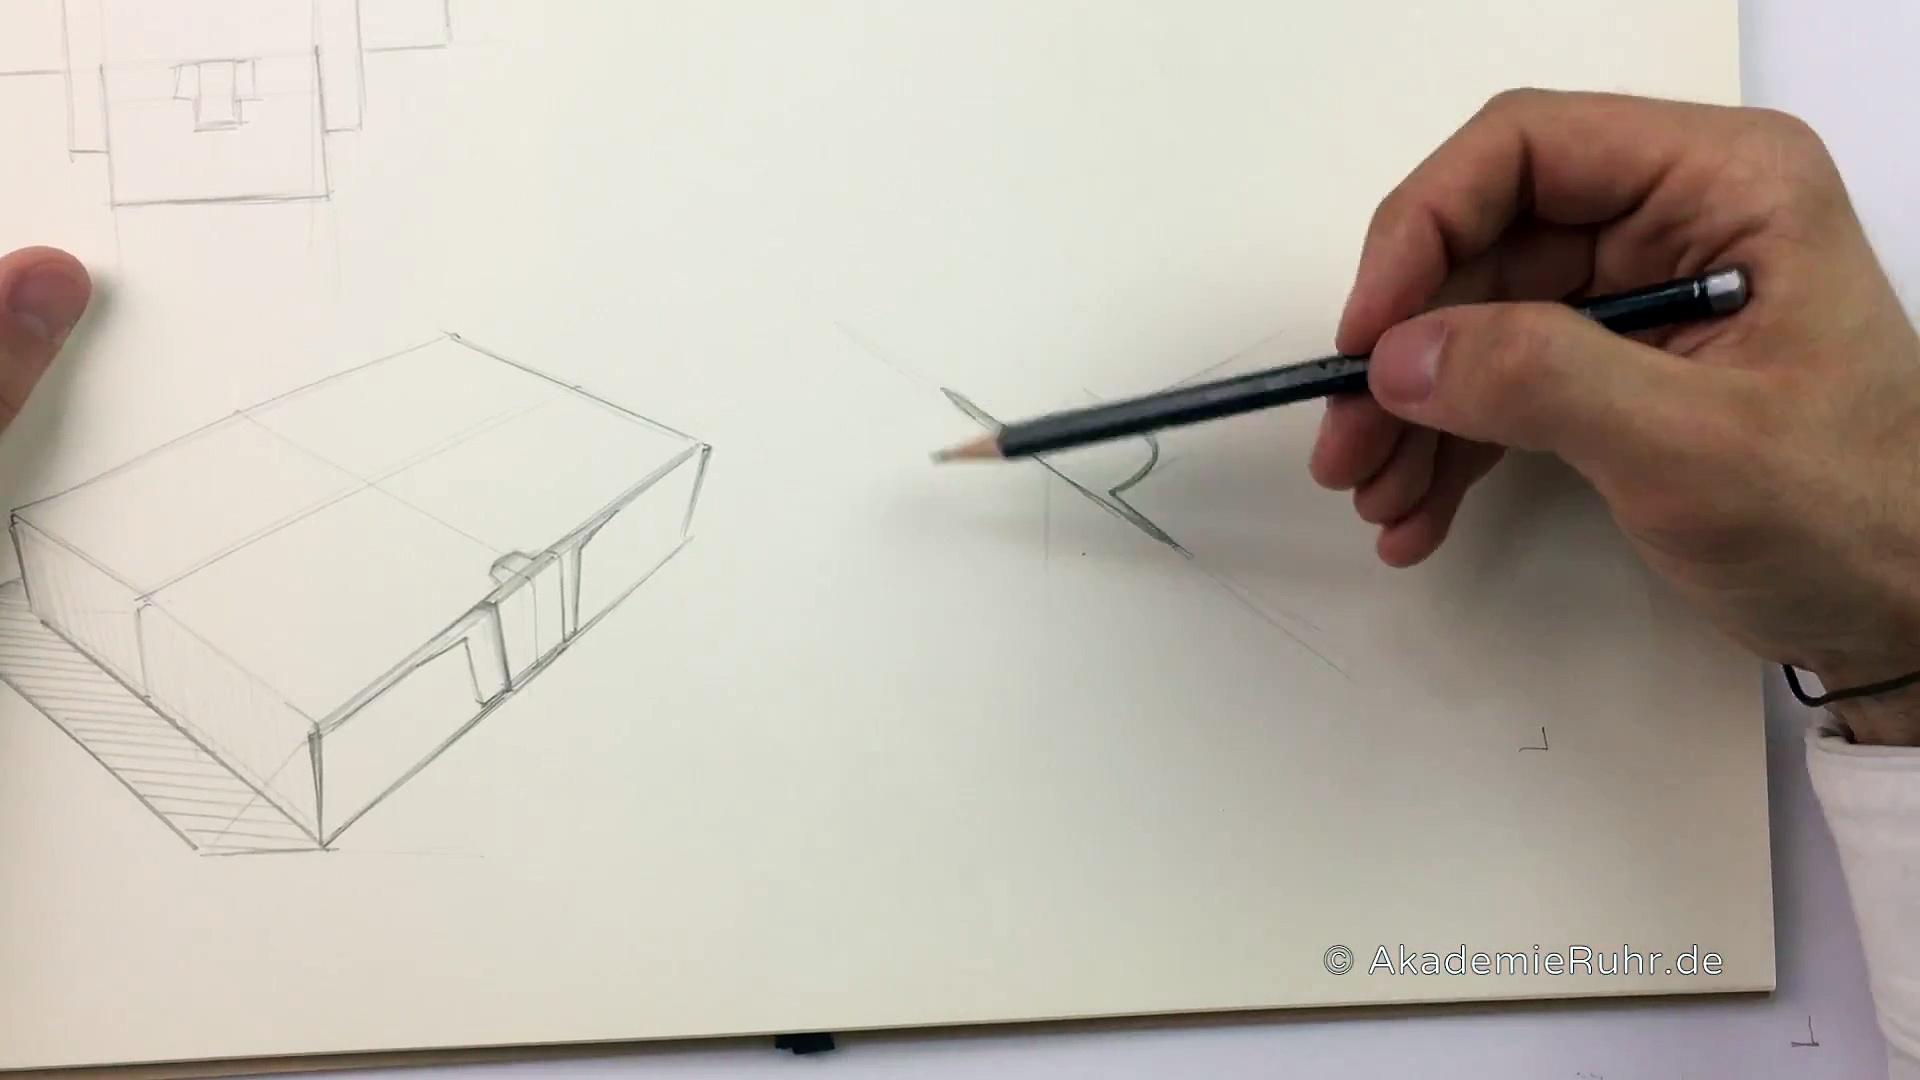 Retail-Design Ideen. Verpackungstechnik. Verpackungs-Design. Mappenkurs Retail-Design-aRlWPItWJT8